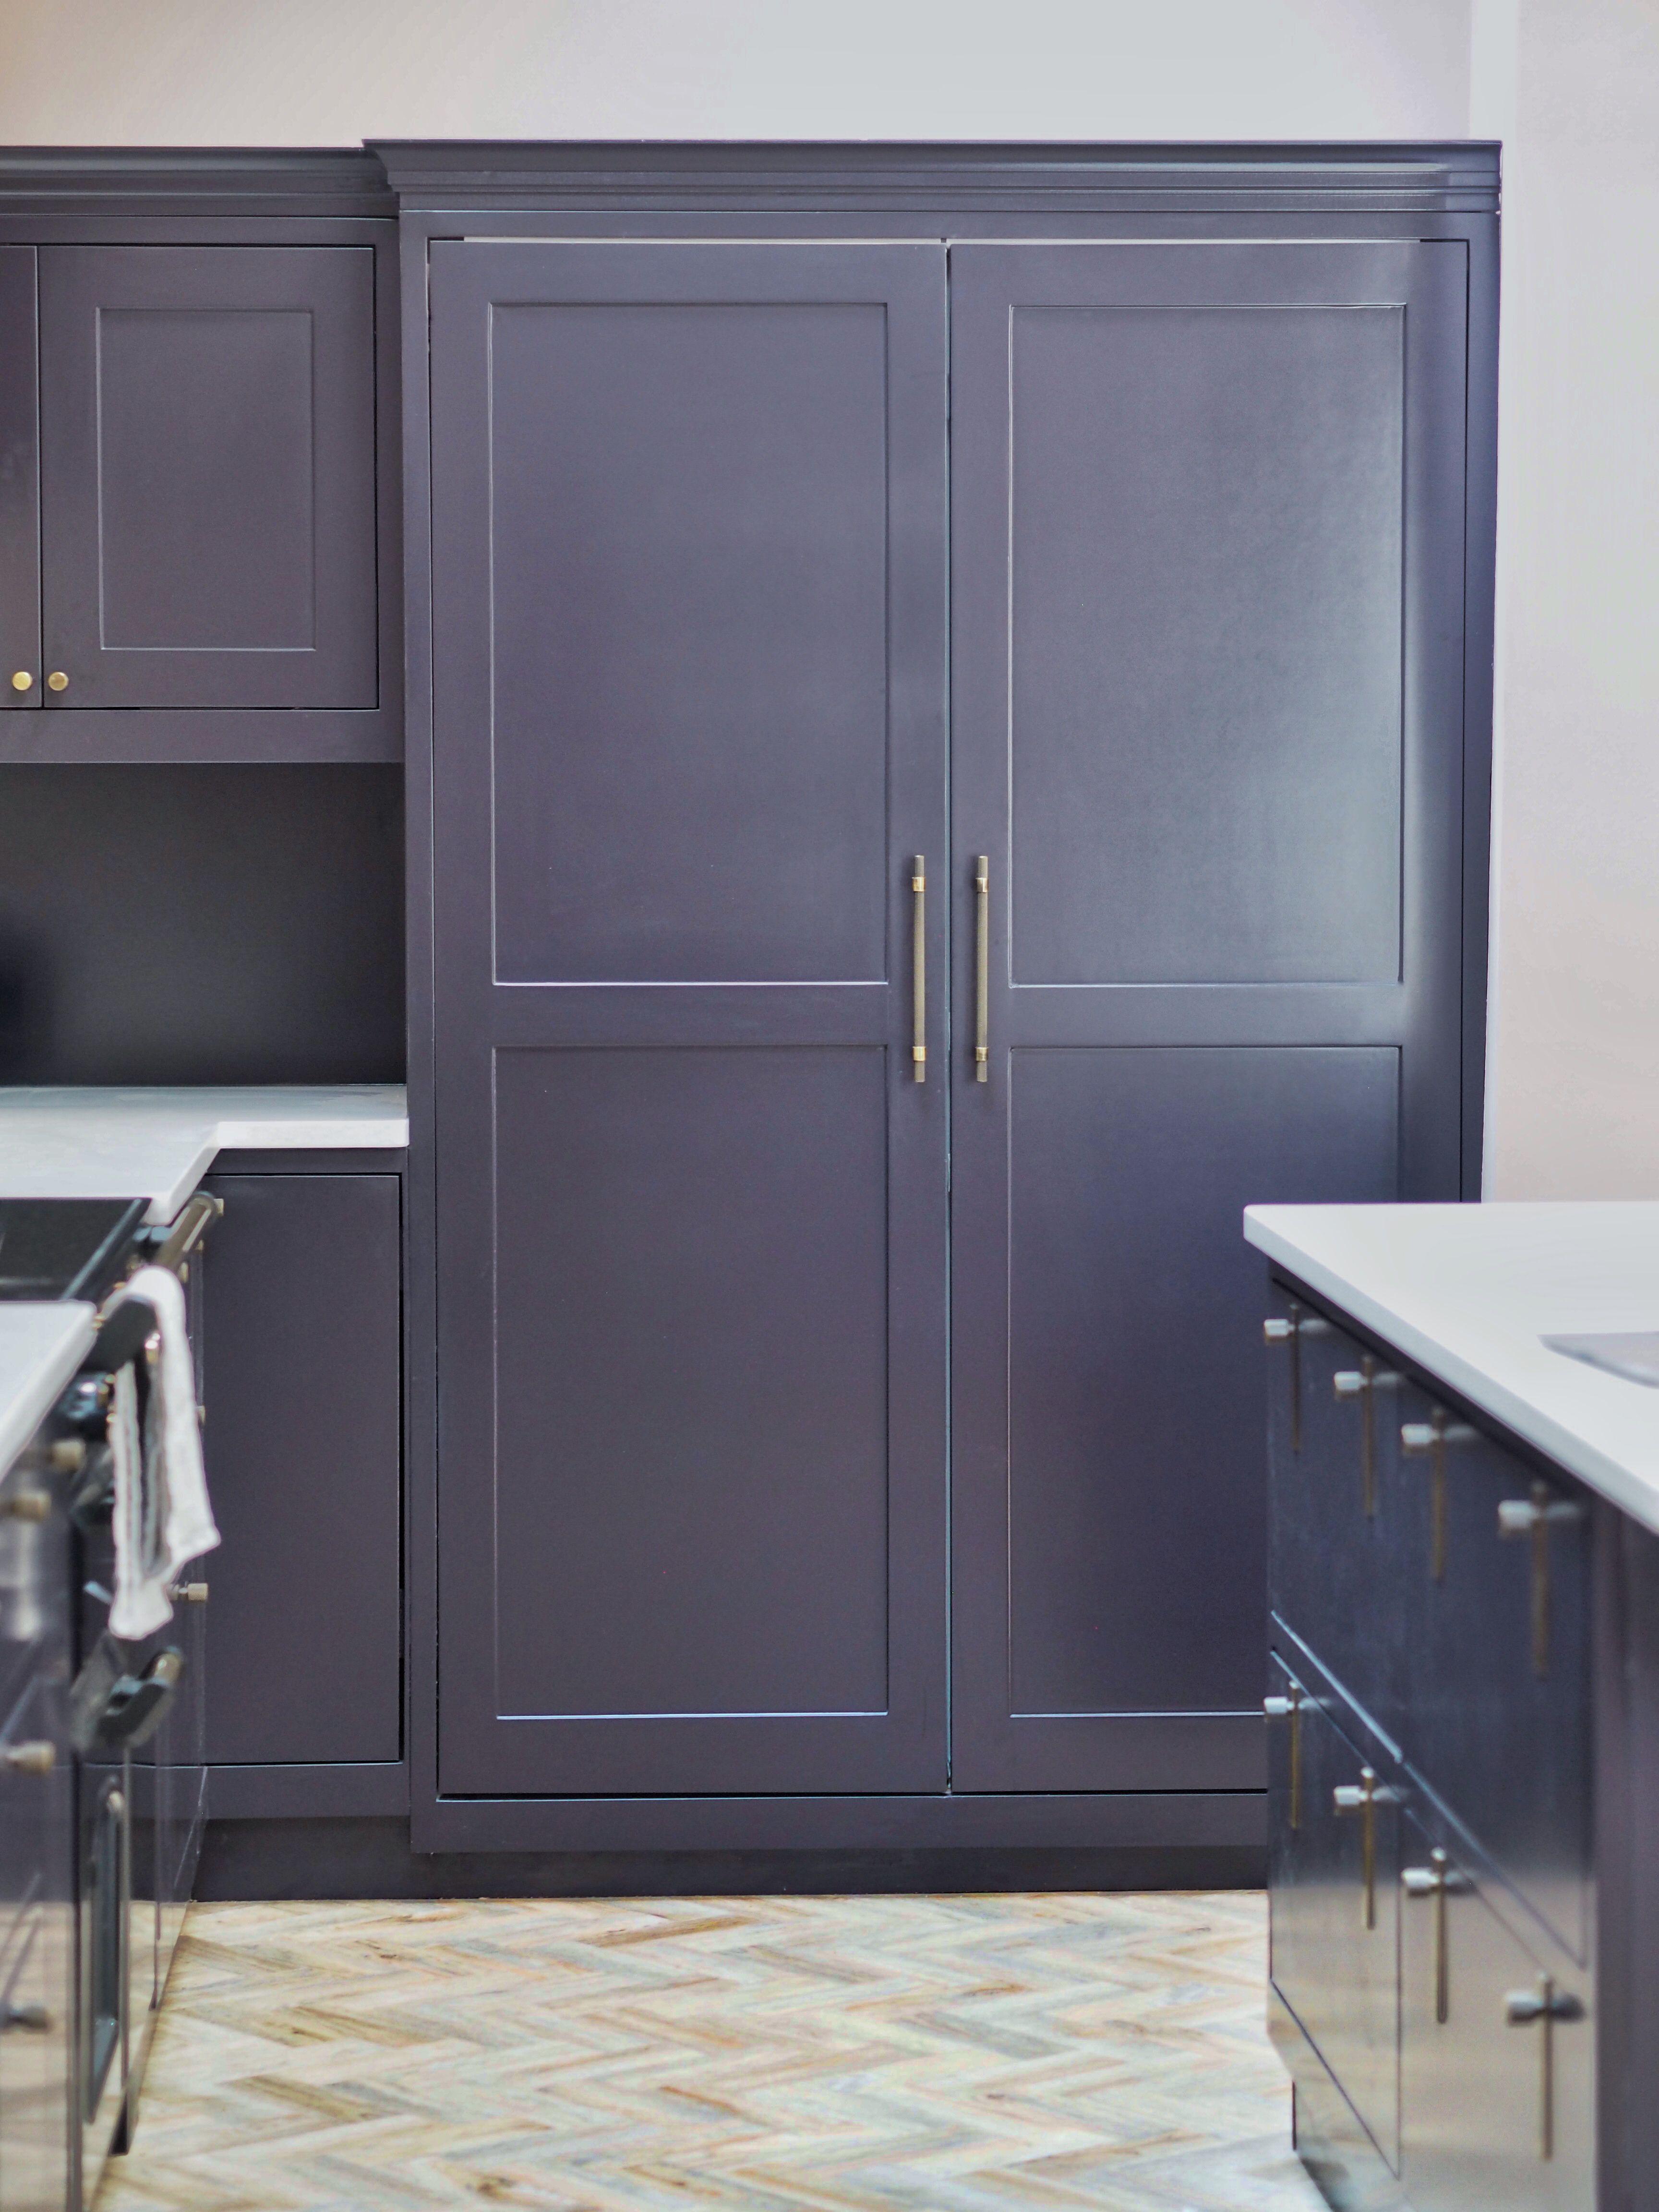 Shaker Kitchen Integrated Fridge Shaker Style Cabinets Shaker Kitchen